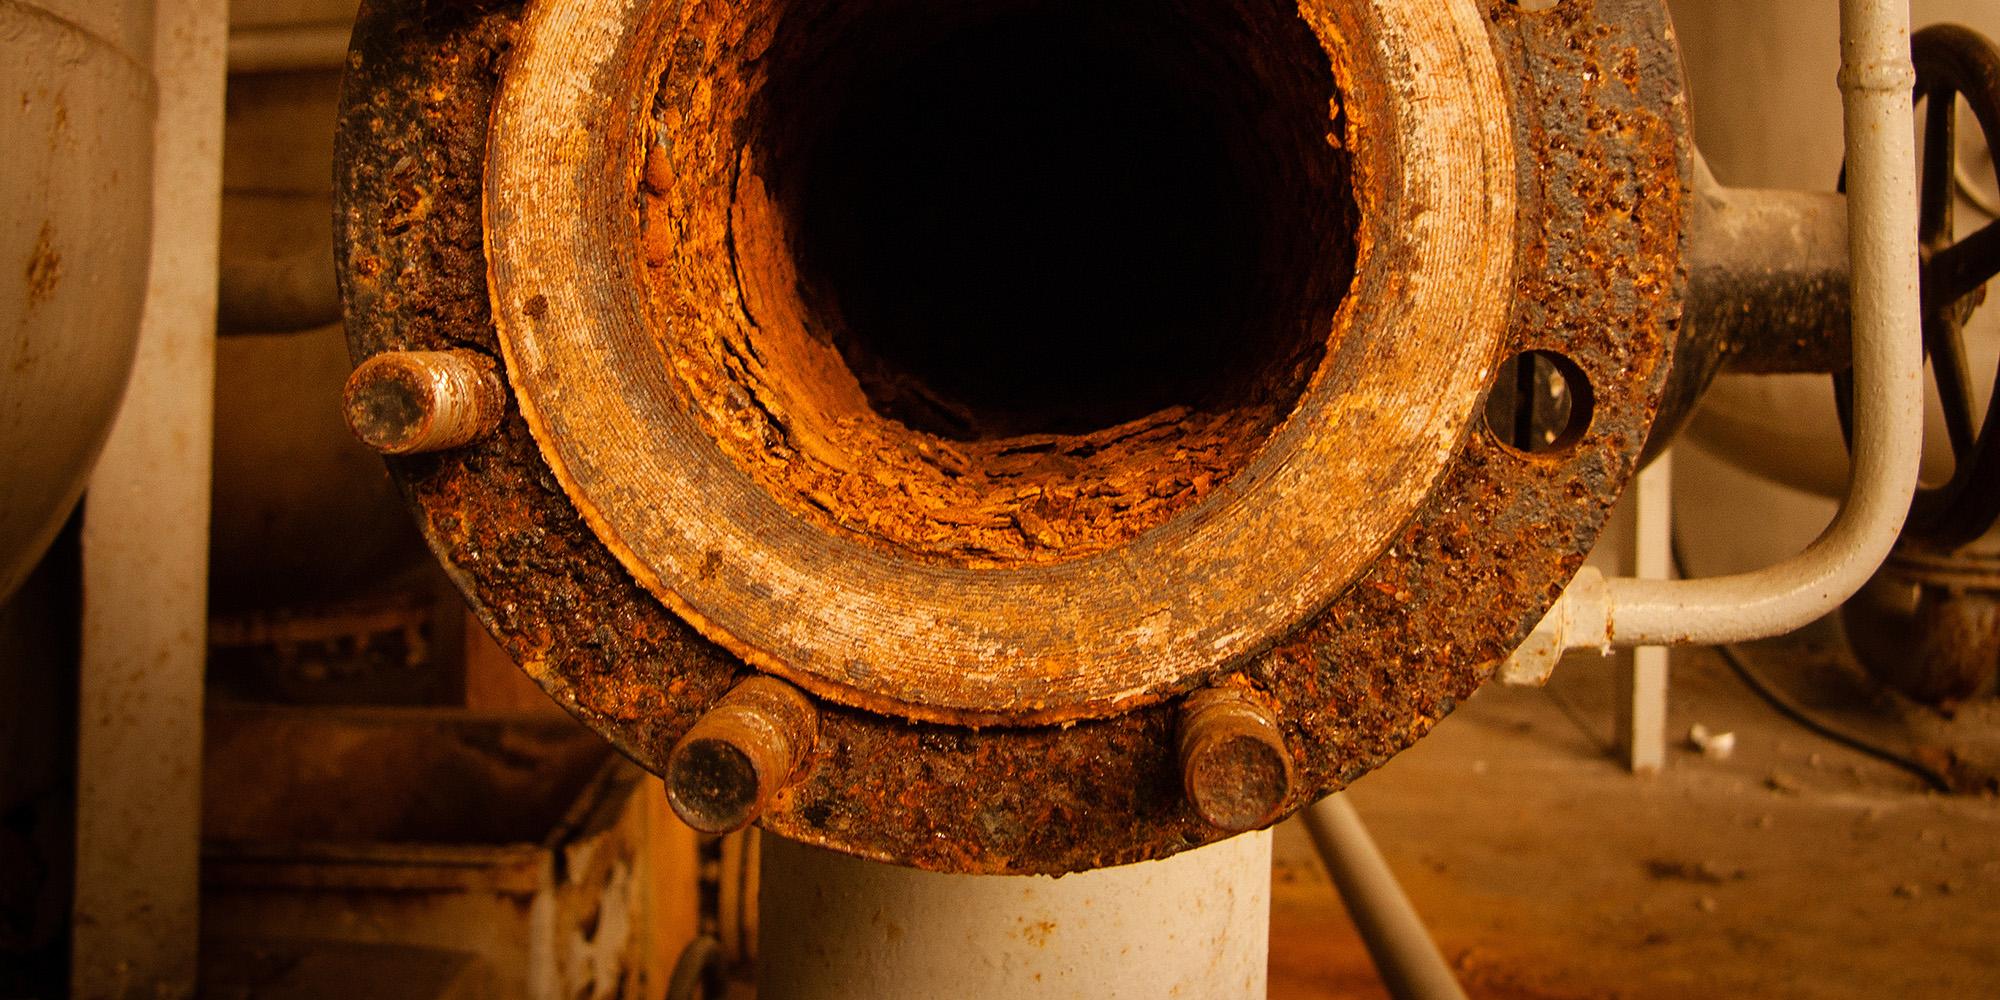 corrosión en tubería. sensor